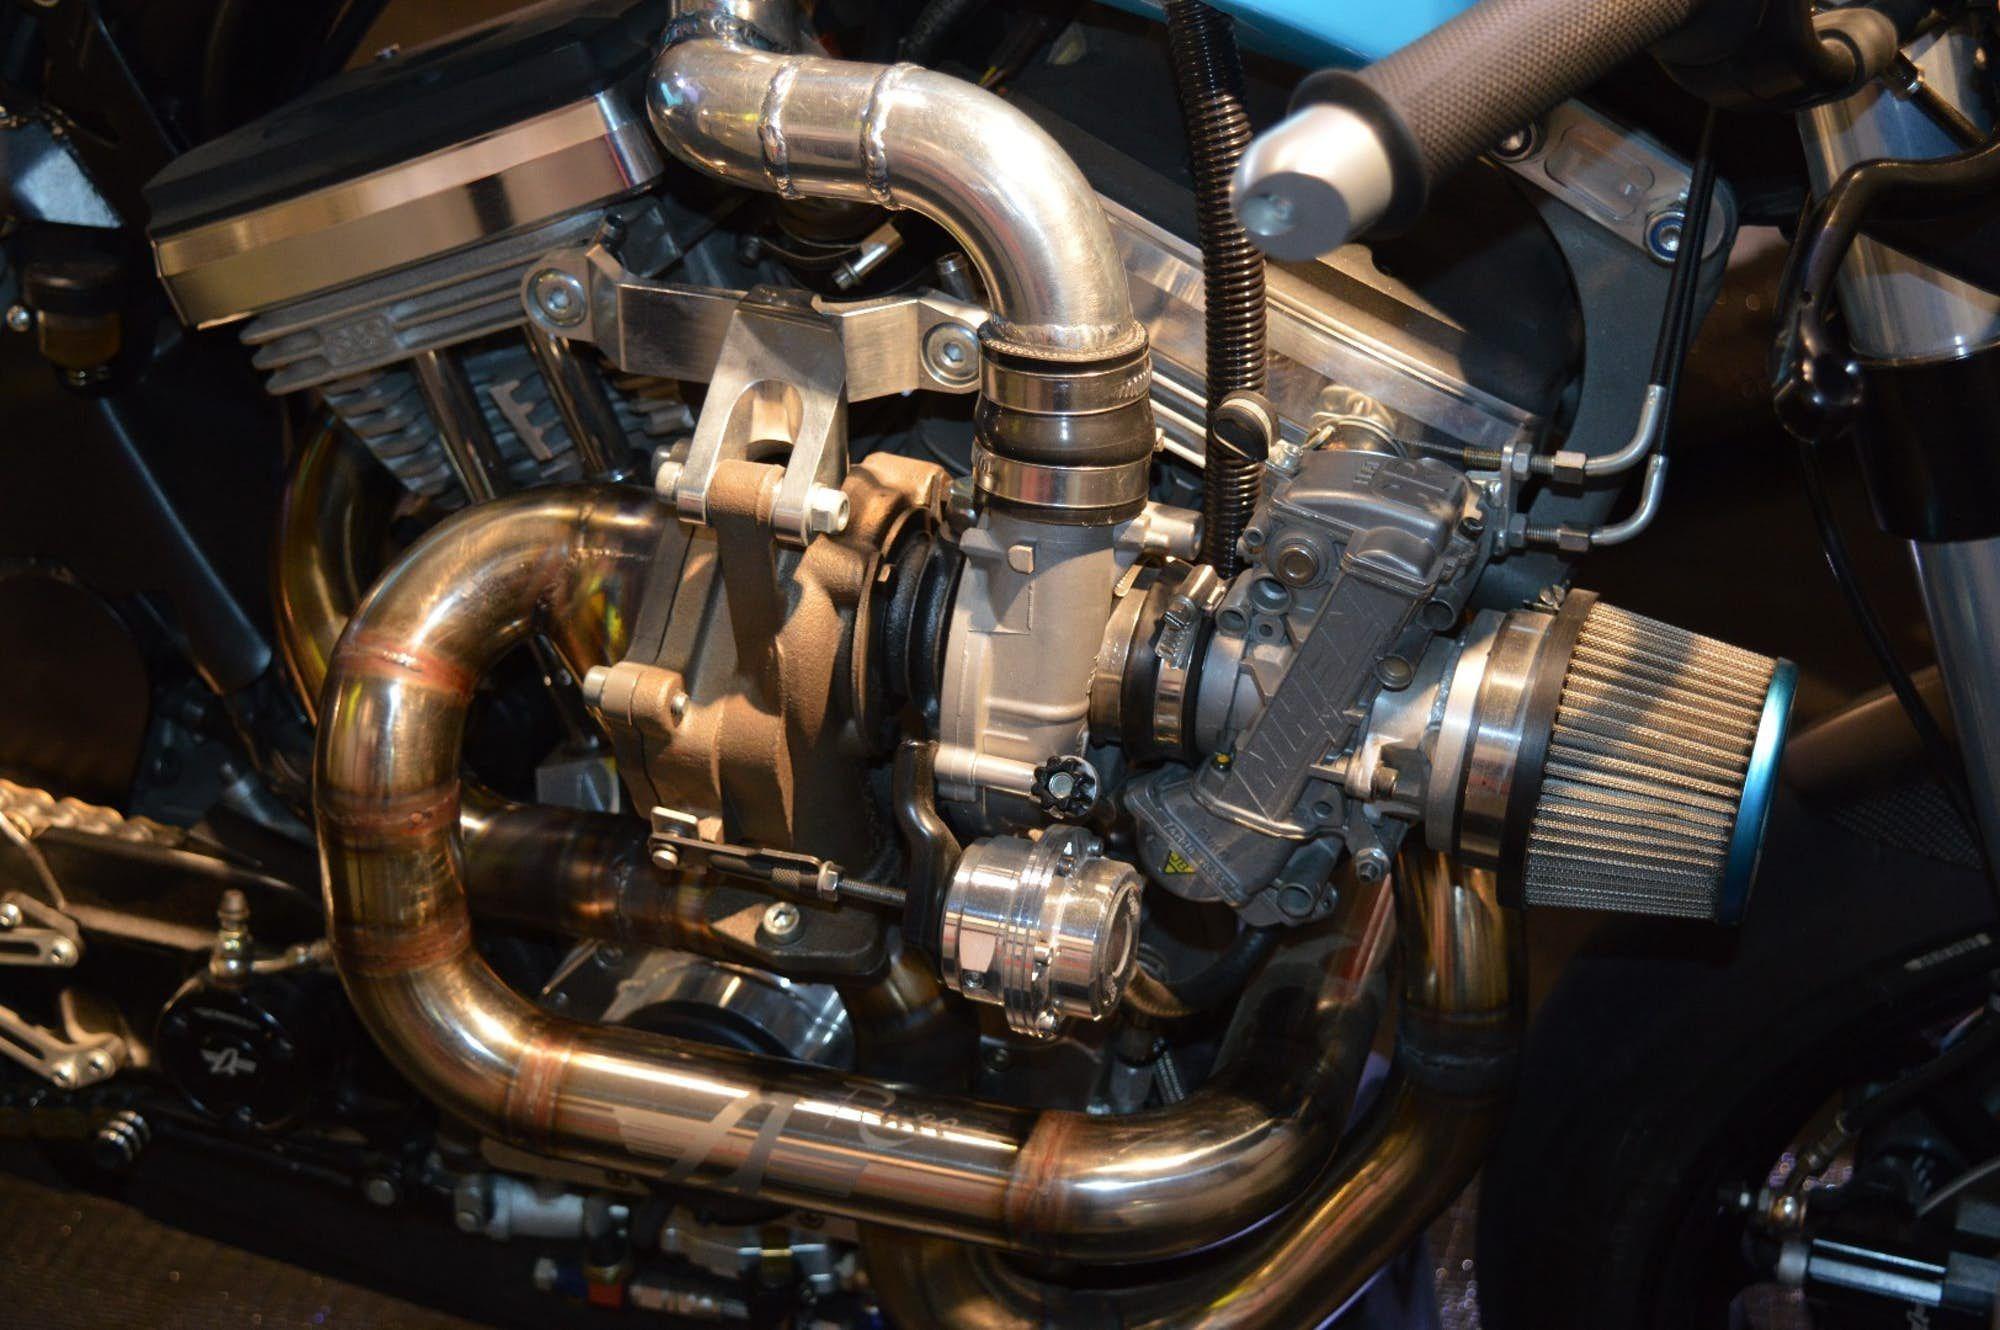 In pictures: EICMA's custom world   ENGINEz-MOTOBIKEz